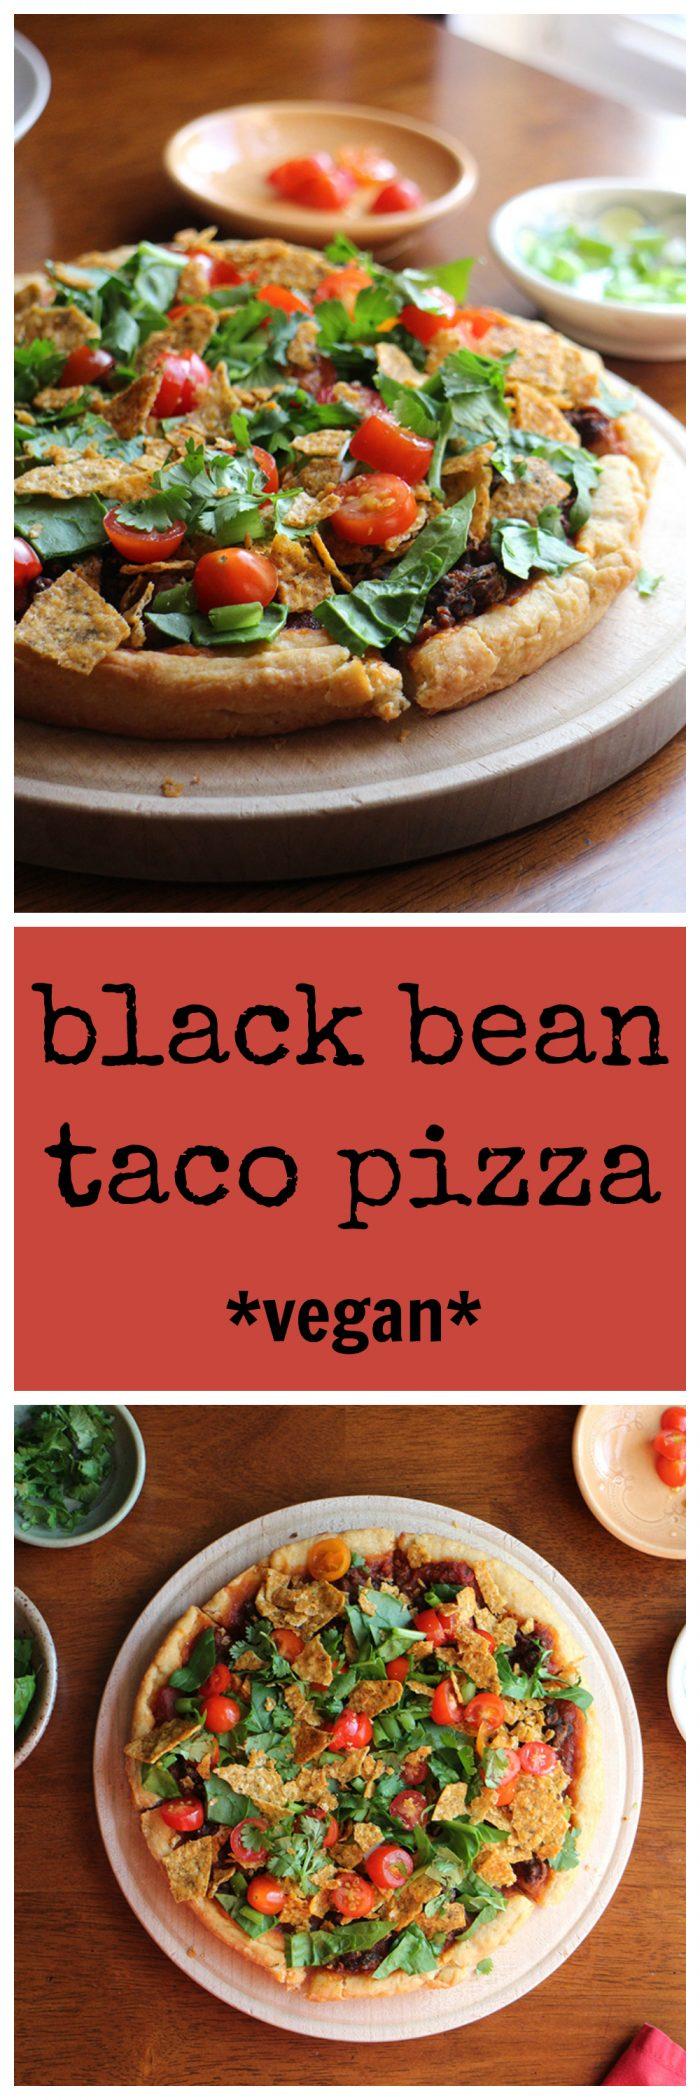 Black bean taco pizza - vegan comfort food & a wonderful weeknight meal | cadryskitchen.com